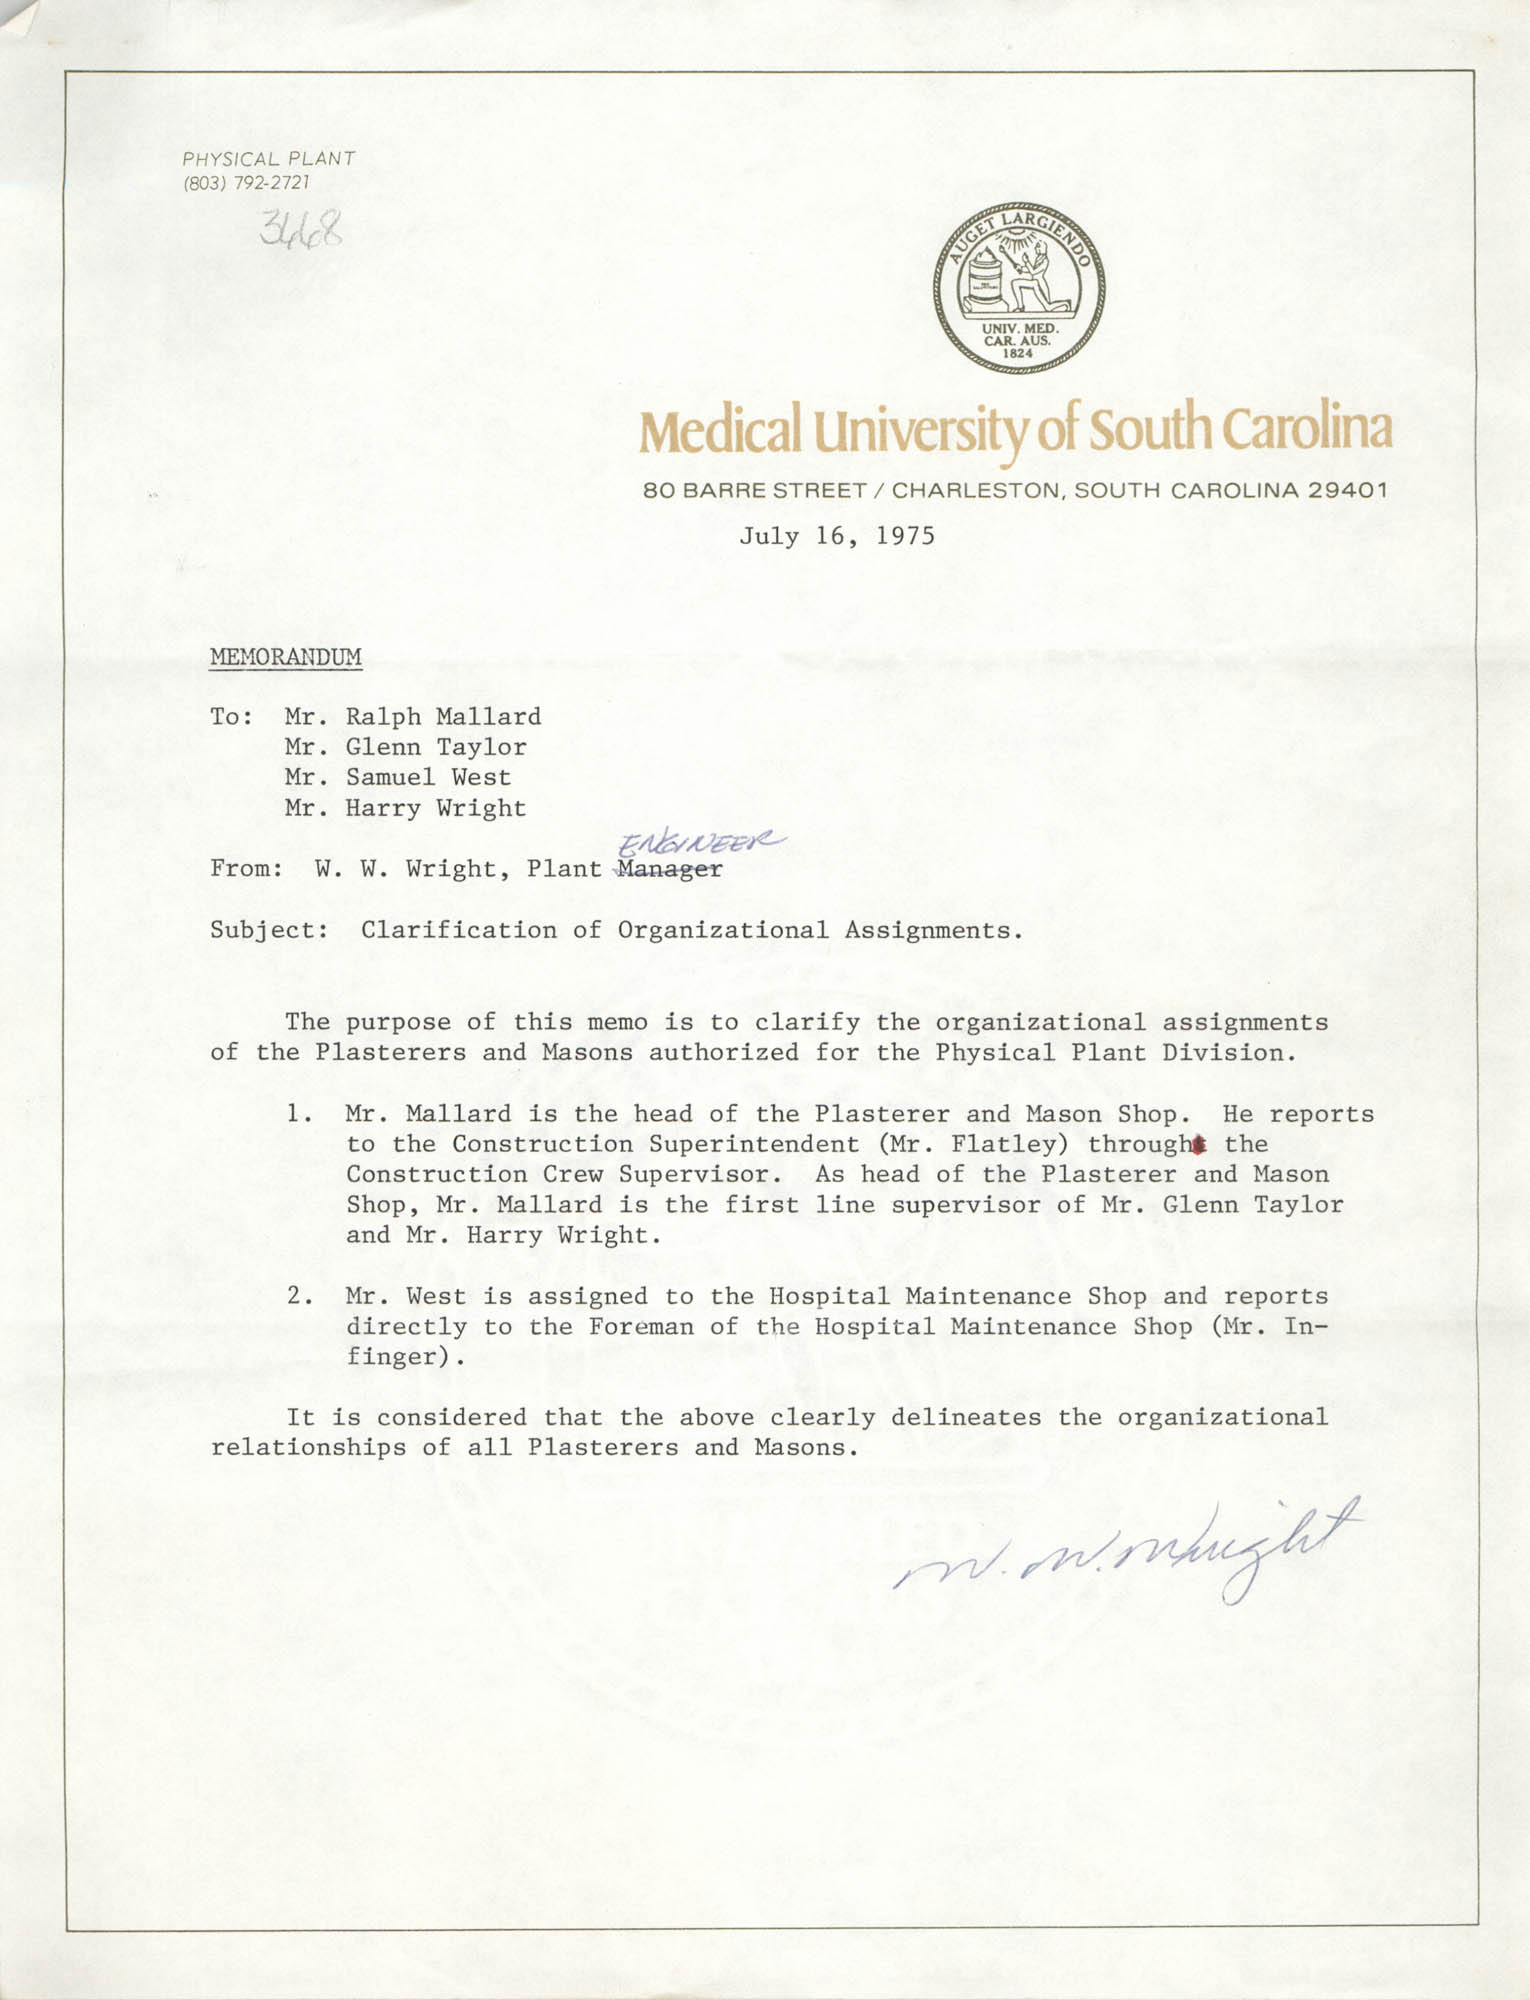 Medical University of South Carolina Memorandum, July 16, 1975